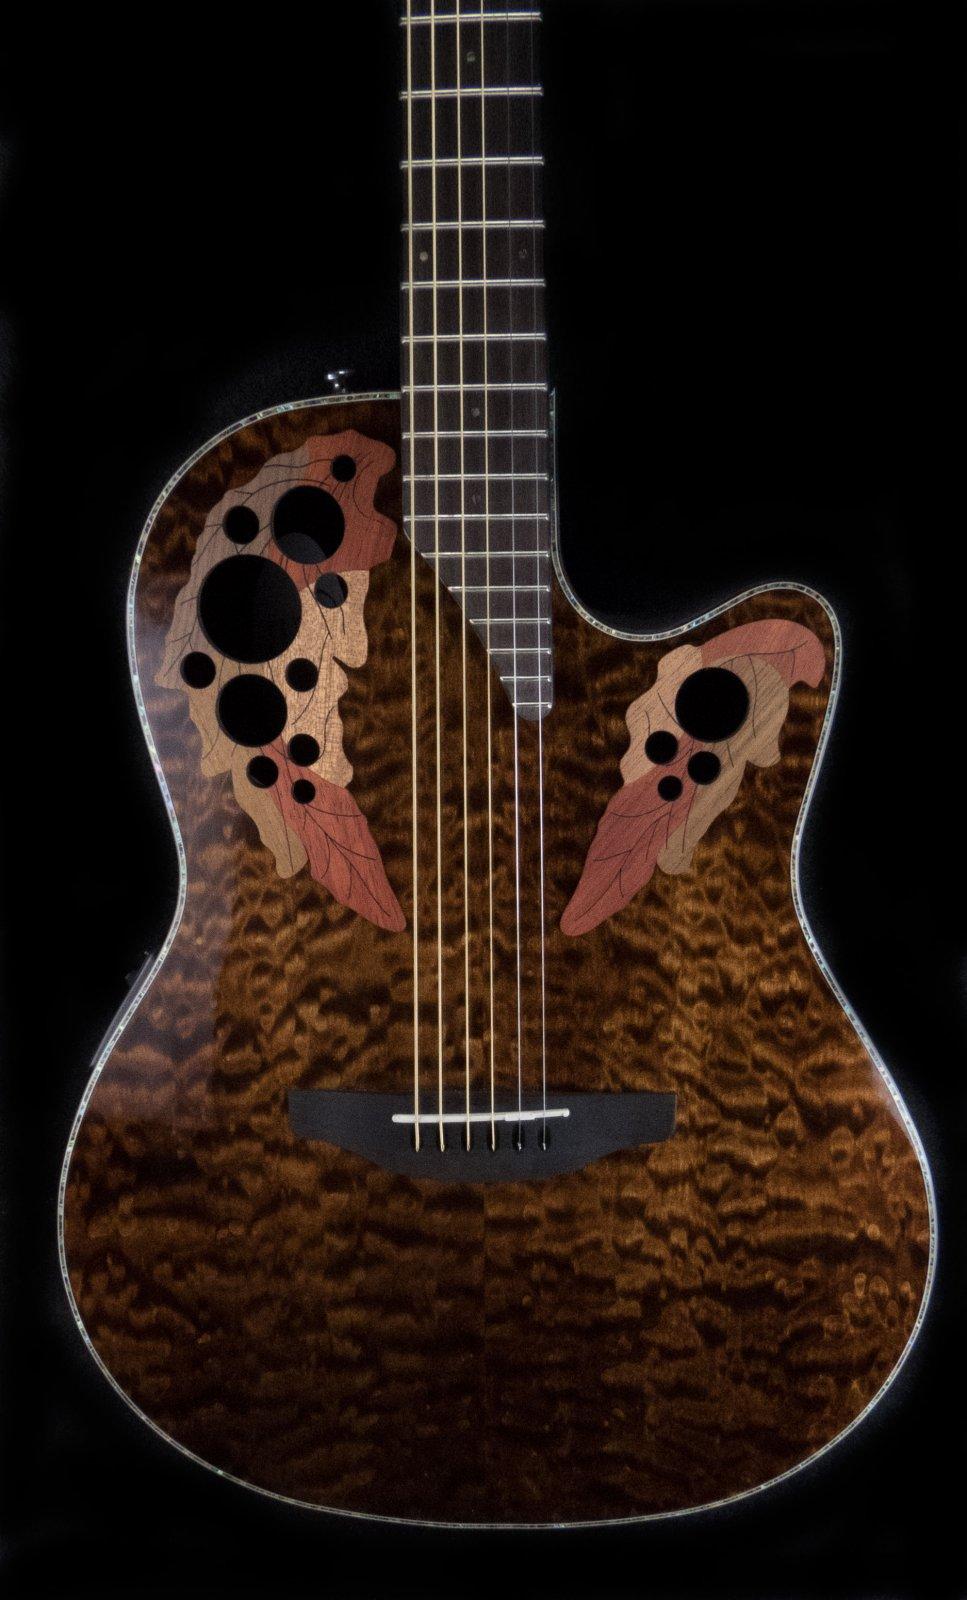 Ovation Celebrity Elite CE44P-TGE Acoustic Electric Guitar w/Hardshell Case